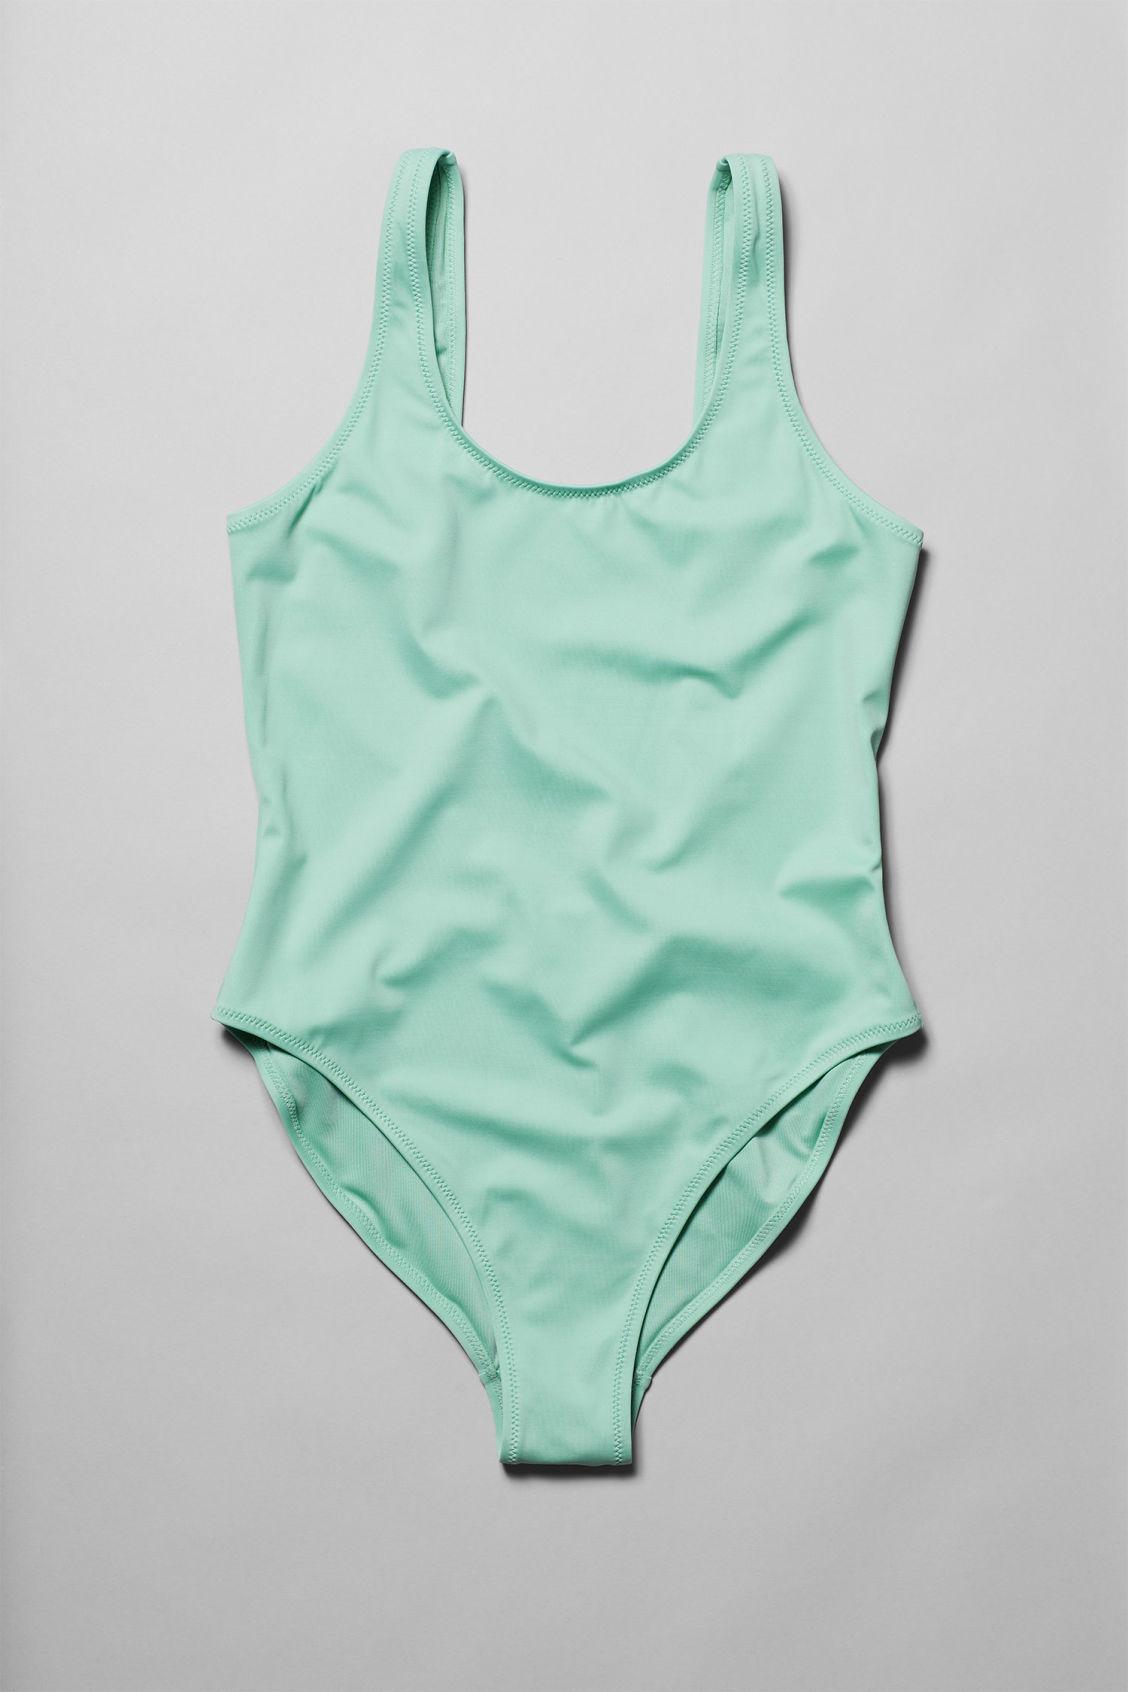 34b38d2d0c Emerald Swimsuit - Green - Swimwear - Weekday